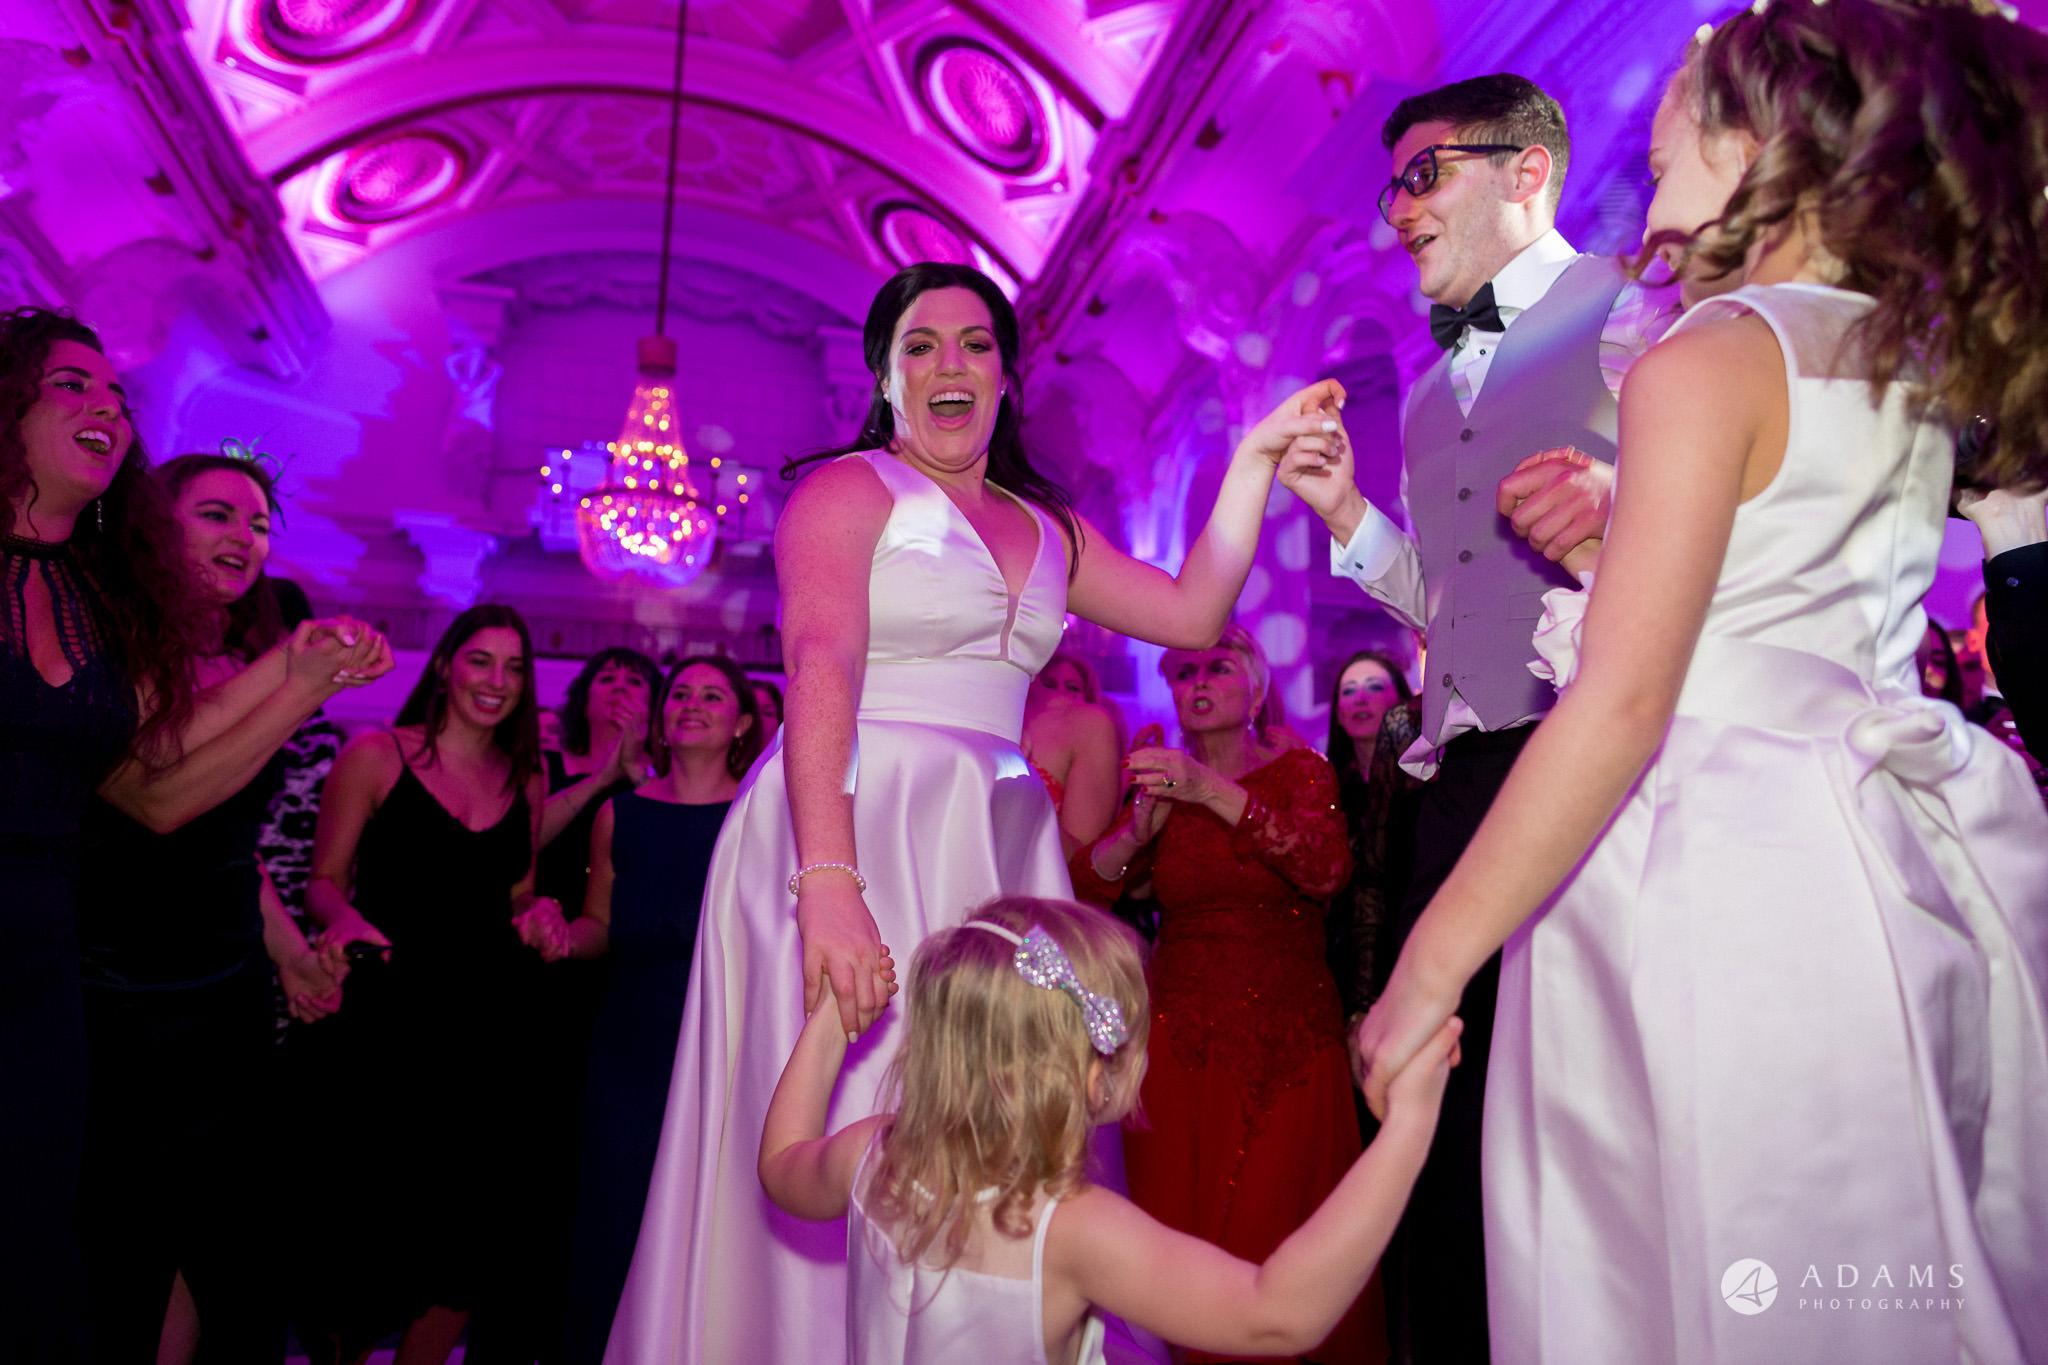 De Vere grand connaught rooms photographer couple dancing